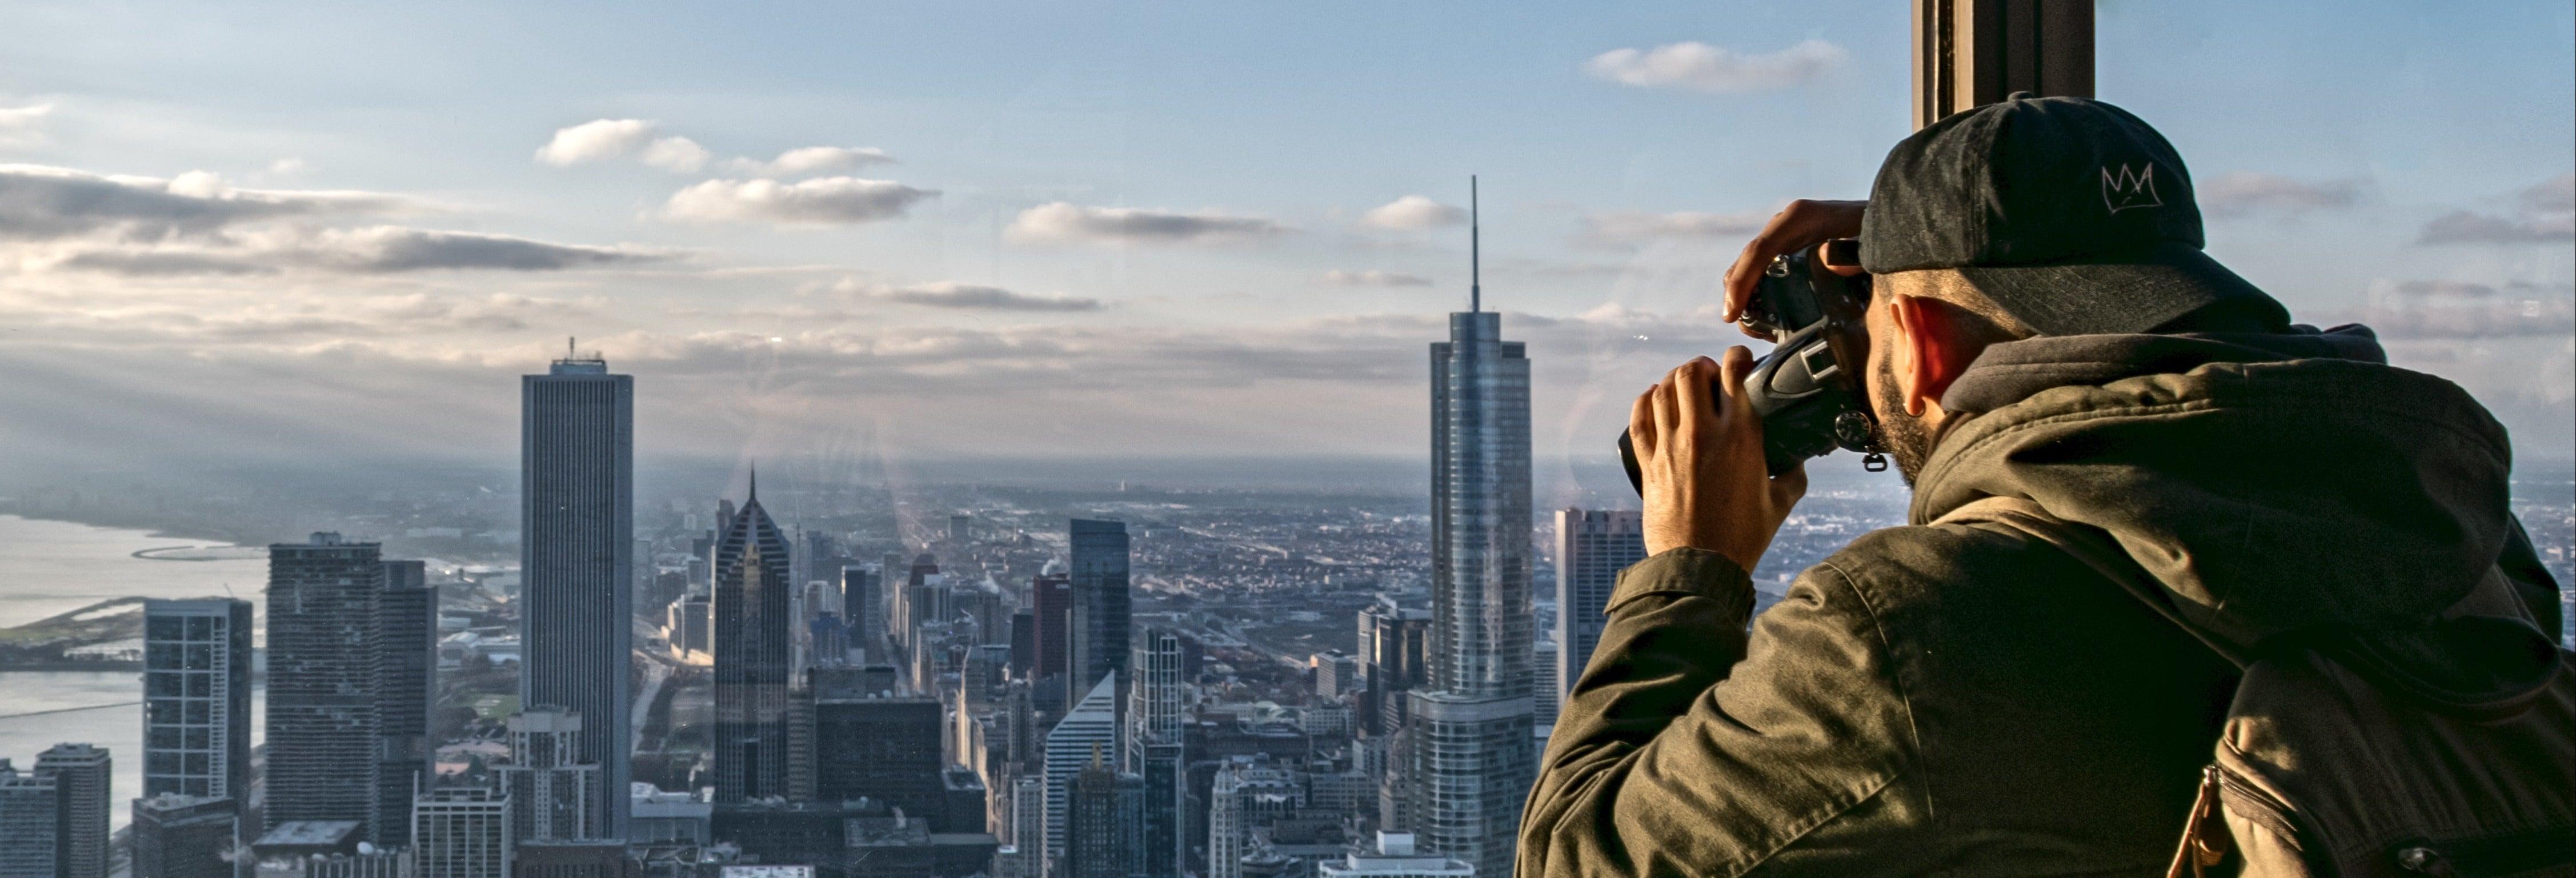 Ingresso para 360 Chicago Observation Deck